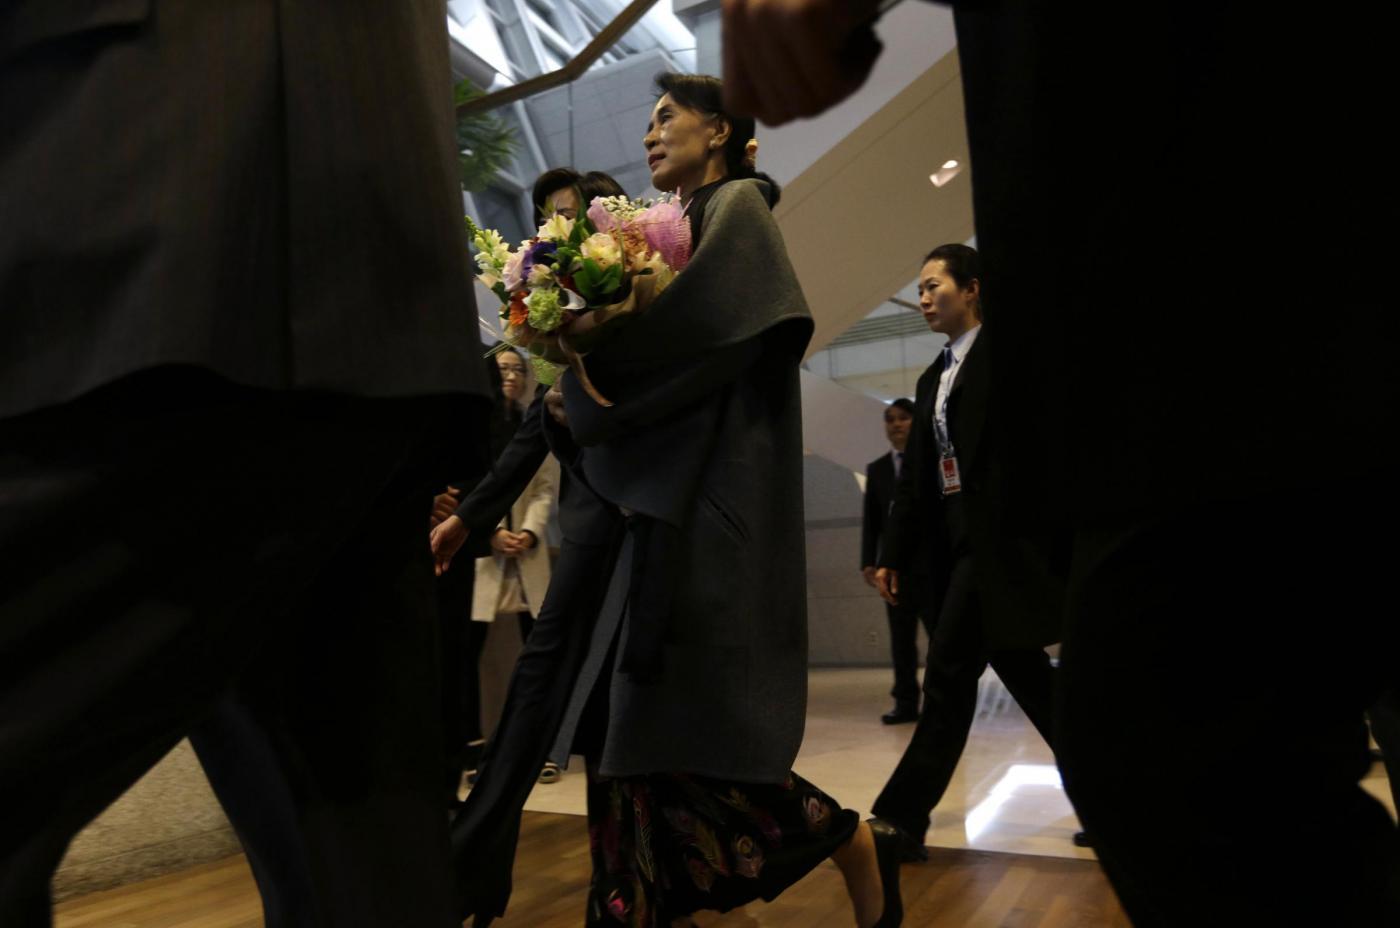 Aung San Suu Kyi in visita in Corea del sud04